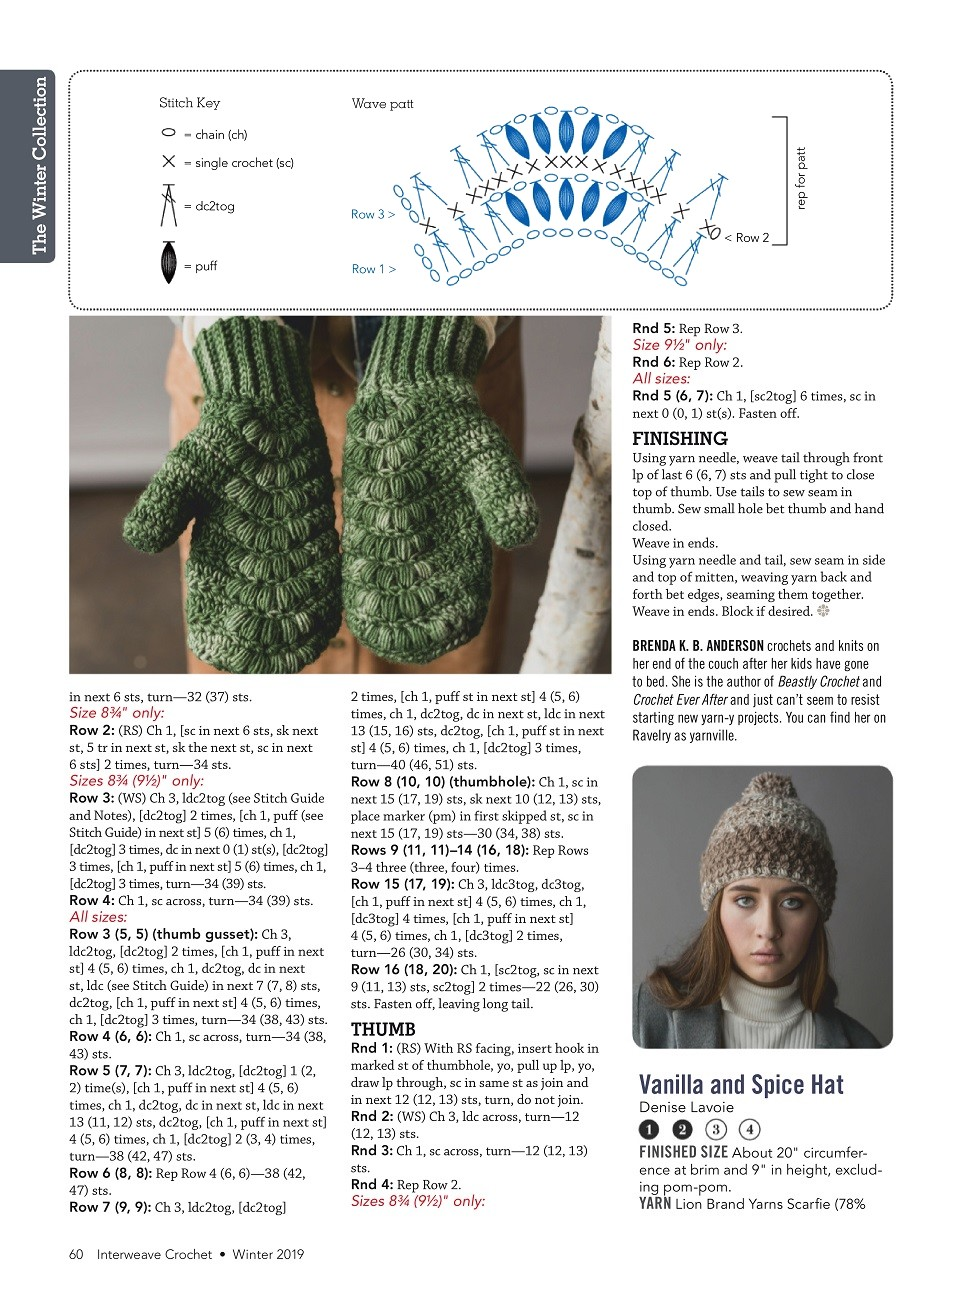 Interweave Crochet Winter 2019-61